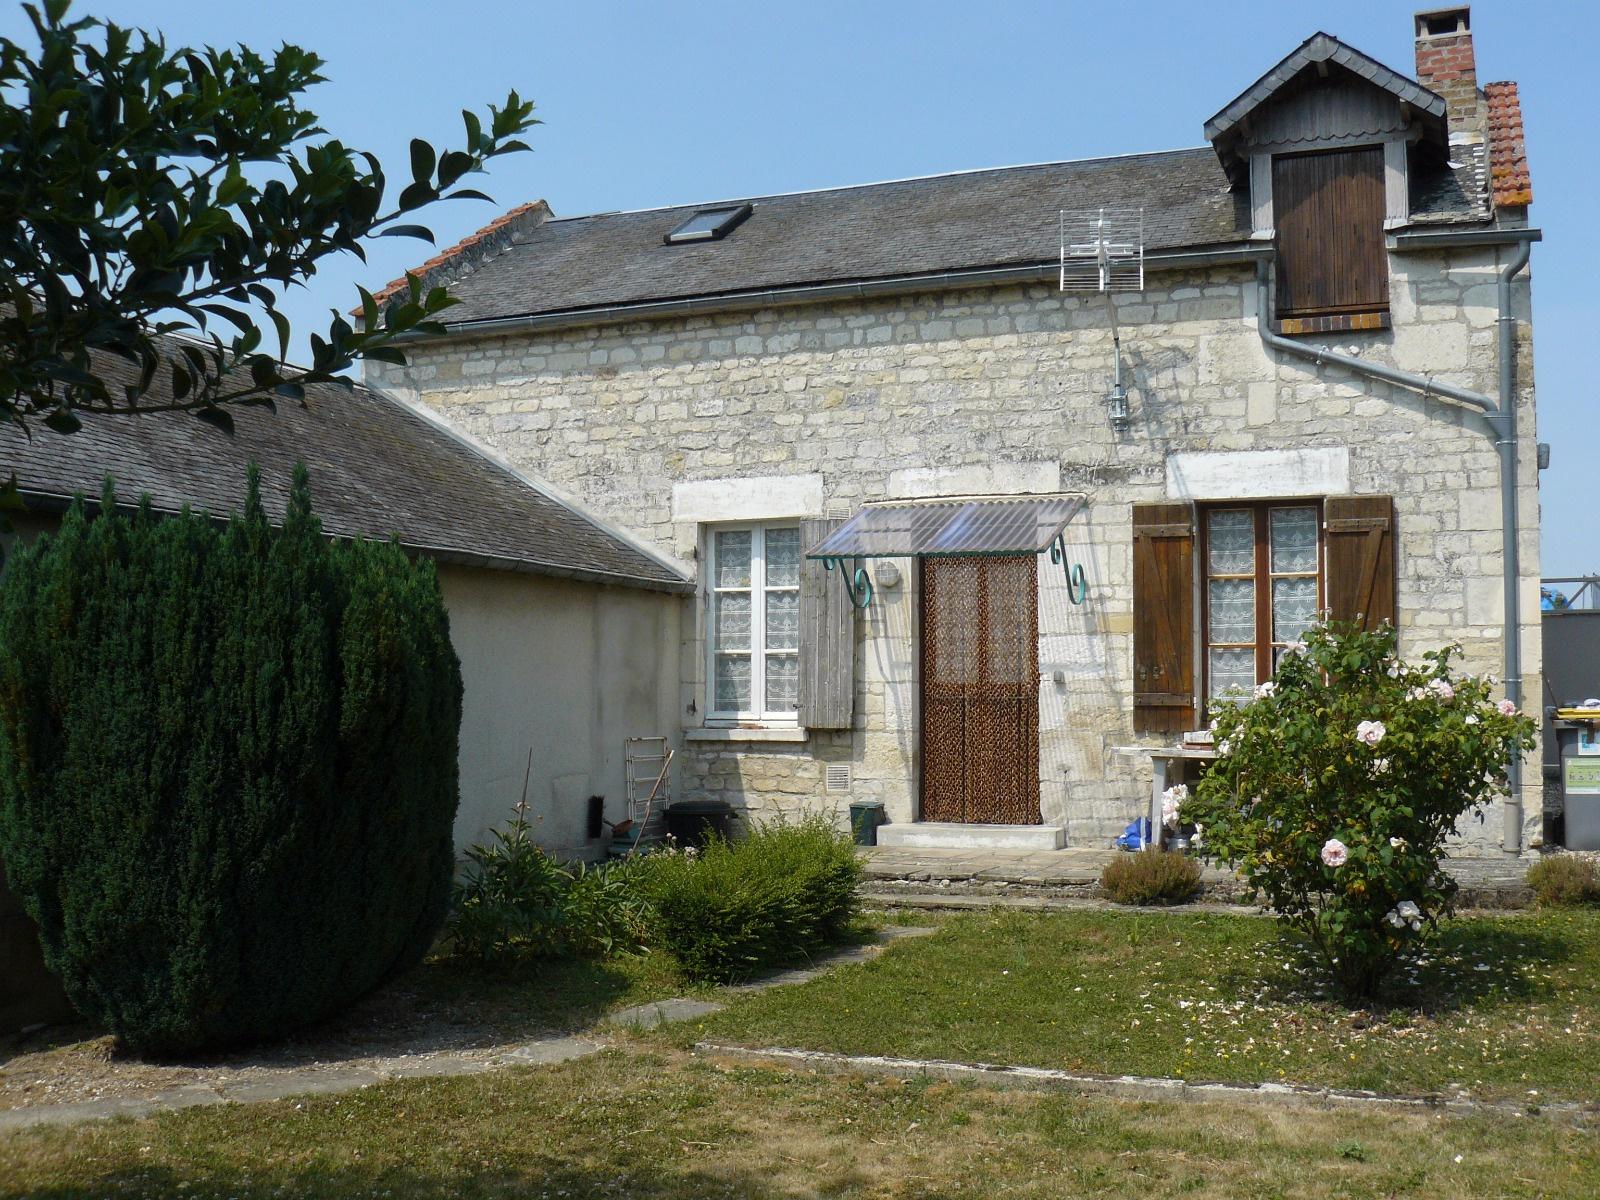 Imonet immobilier bussy st georges et environs for Maison guignicourt